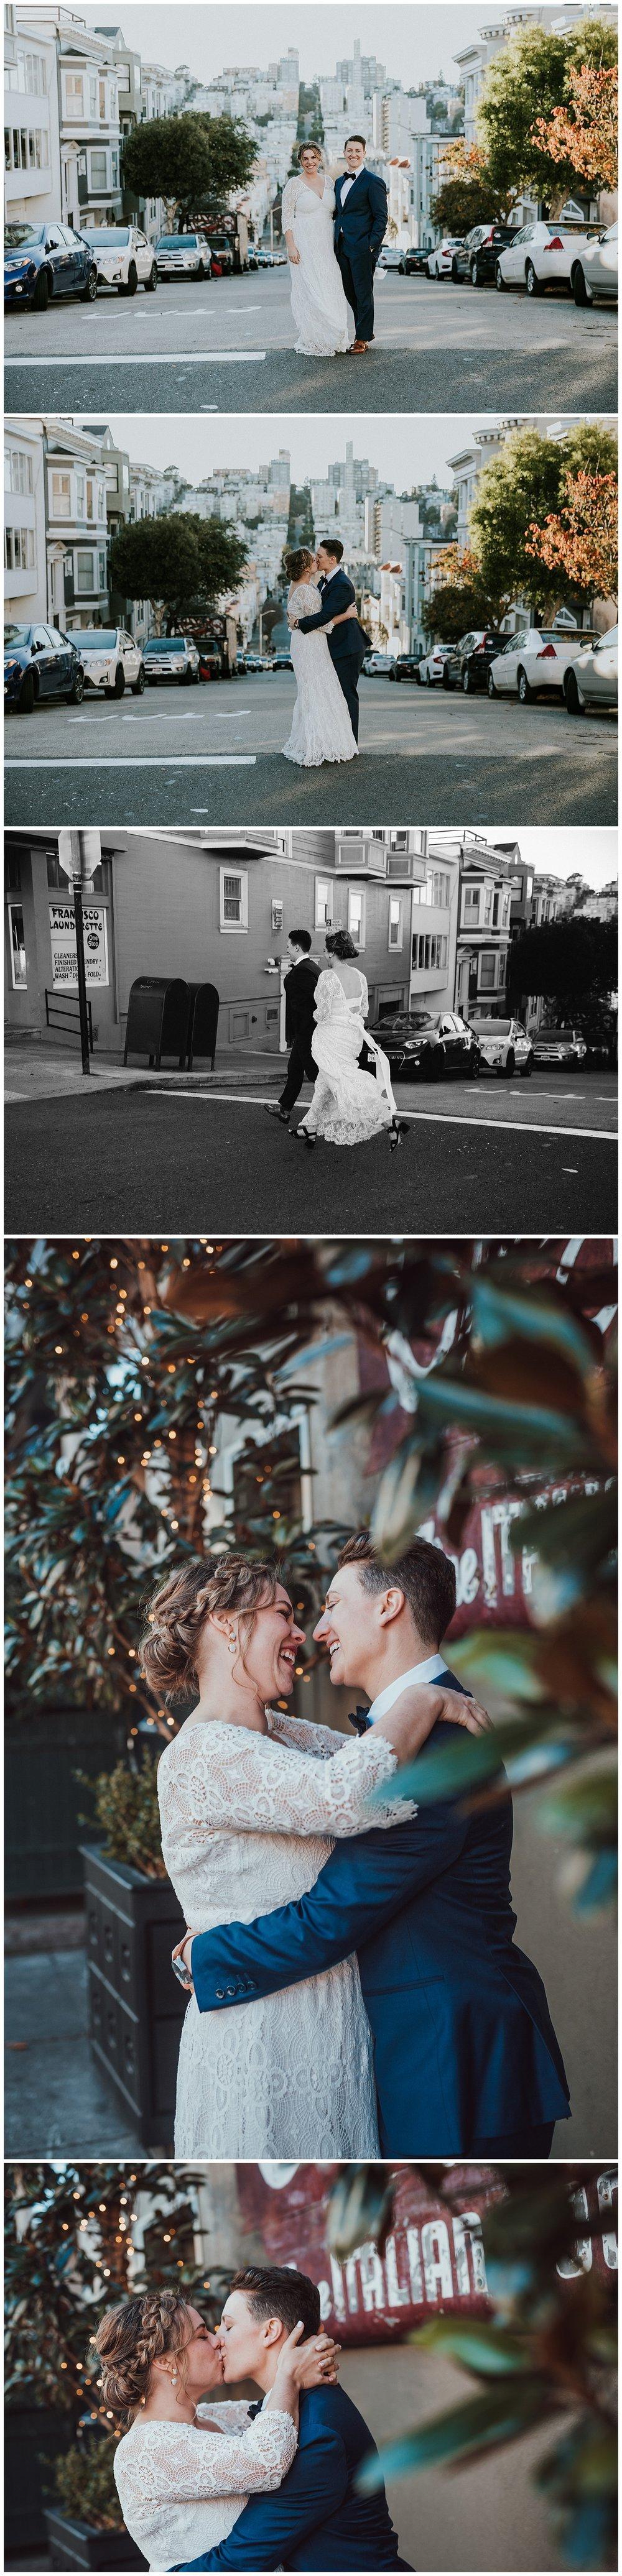 intimateLGBTQsanfranciscowedding18_StudioXIIIPhotography